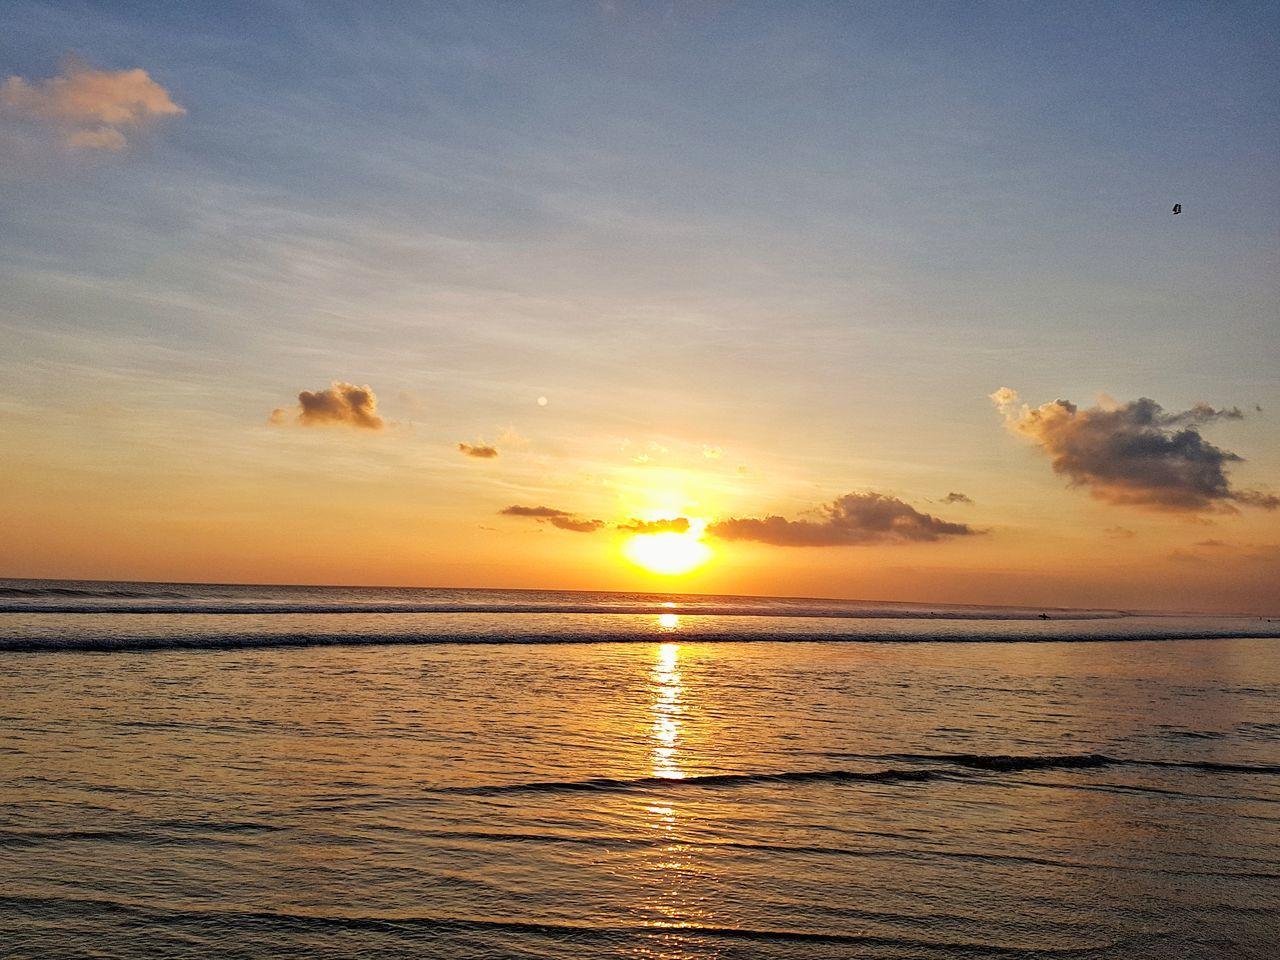 sunset, sea, sun, scenics, beauty in nature, tranquil scene, tranquility, water, nature, sky, horizon over water, sunbeam, idyllic, beach, sunlight, silhouette, no people, outdoors, cloud - sky